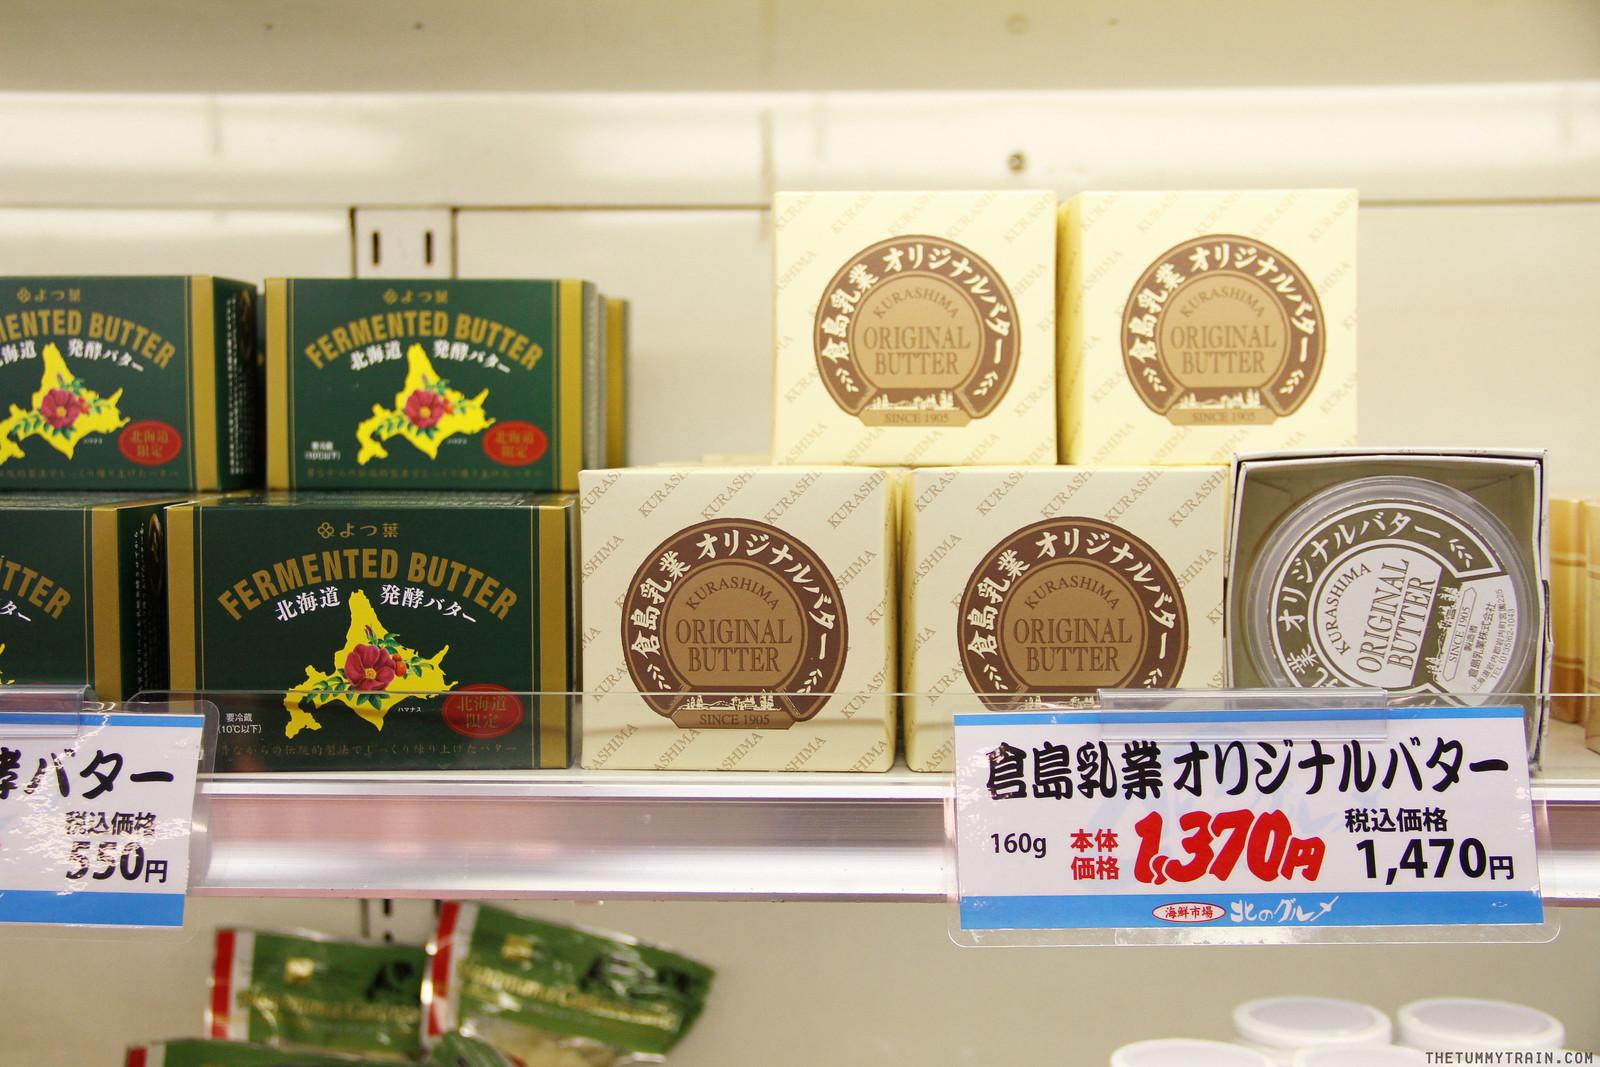 32590130590 2ccaef73e0 h - Sapporo Travel Diary 2017: A brief visit to the Sapporo Central Wholesale Market